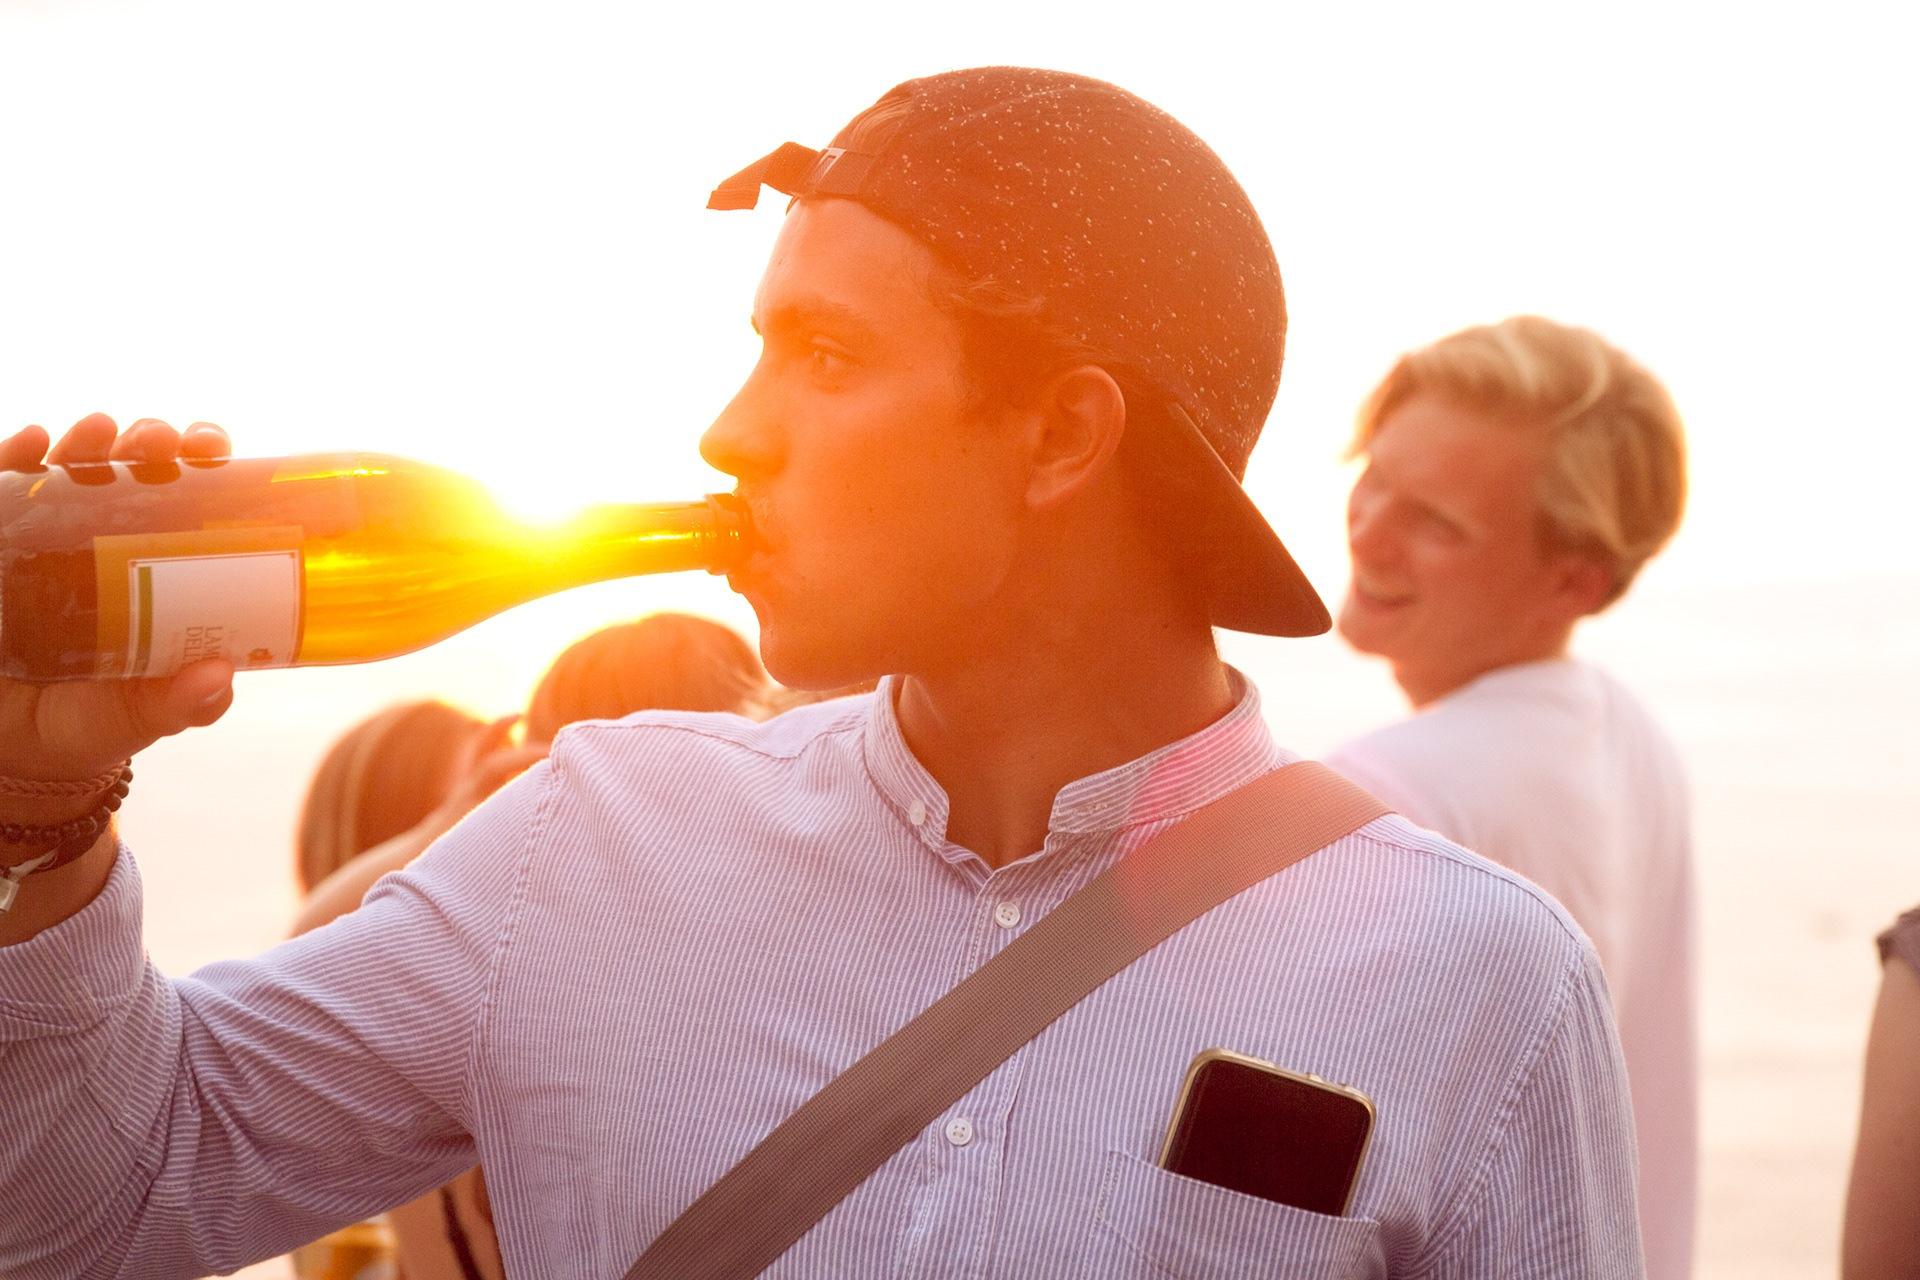 Enjoy the sunset by Adrian Jaffé